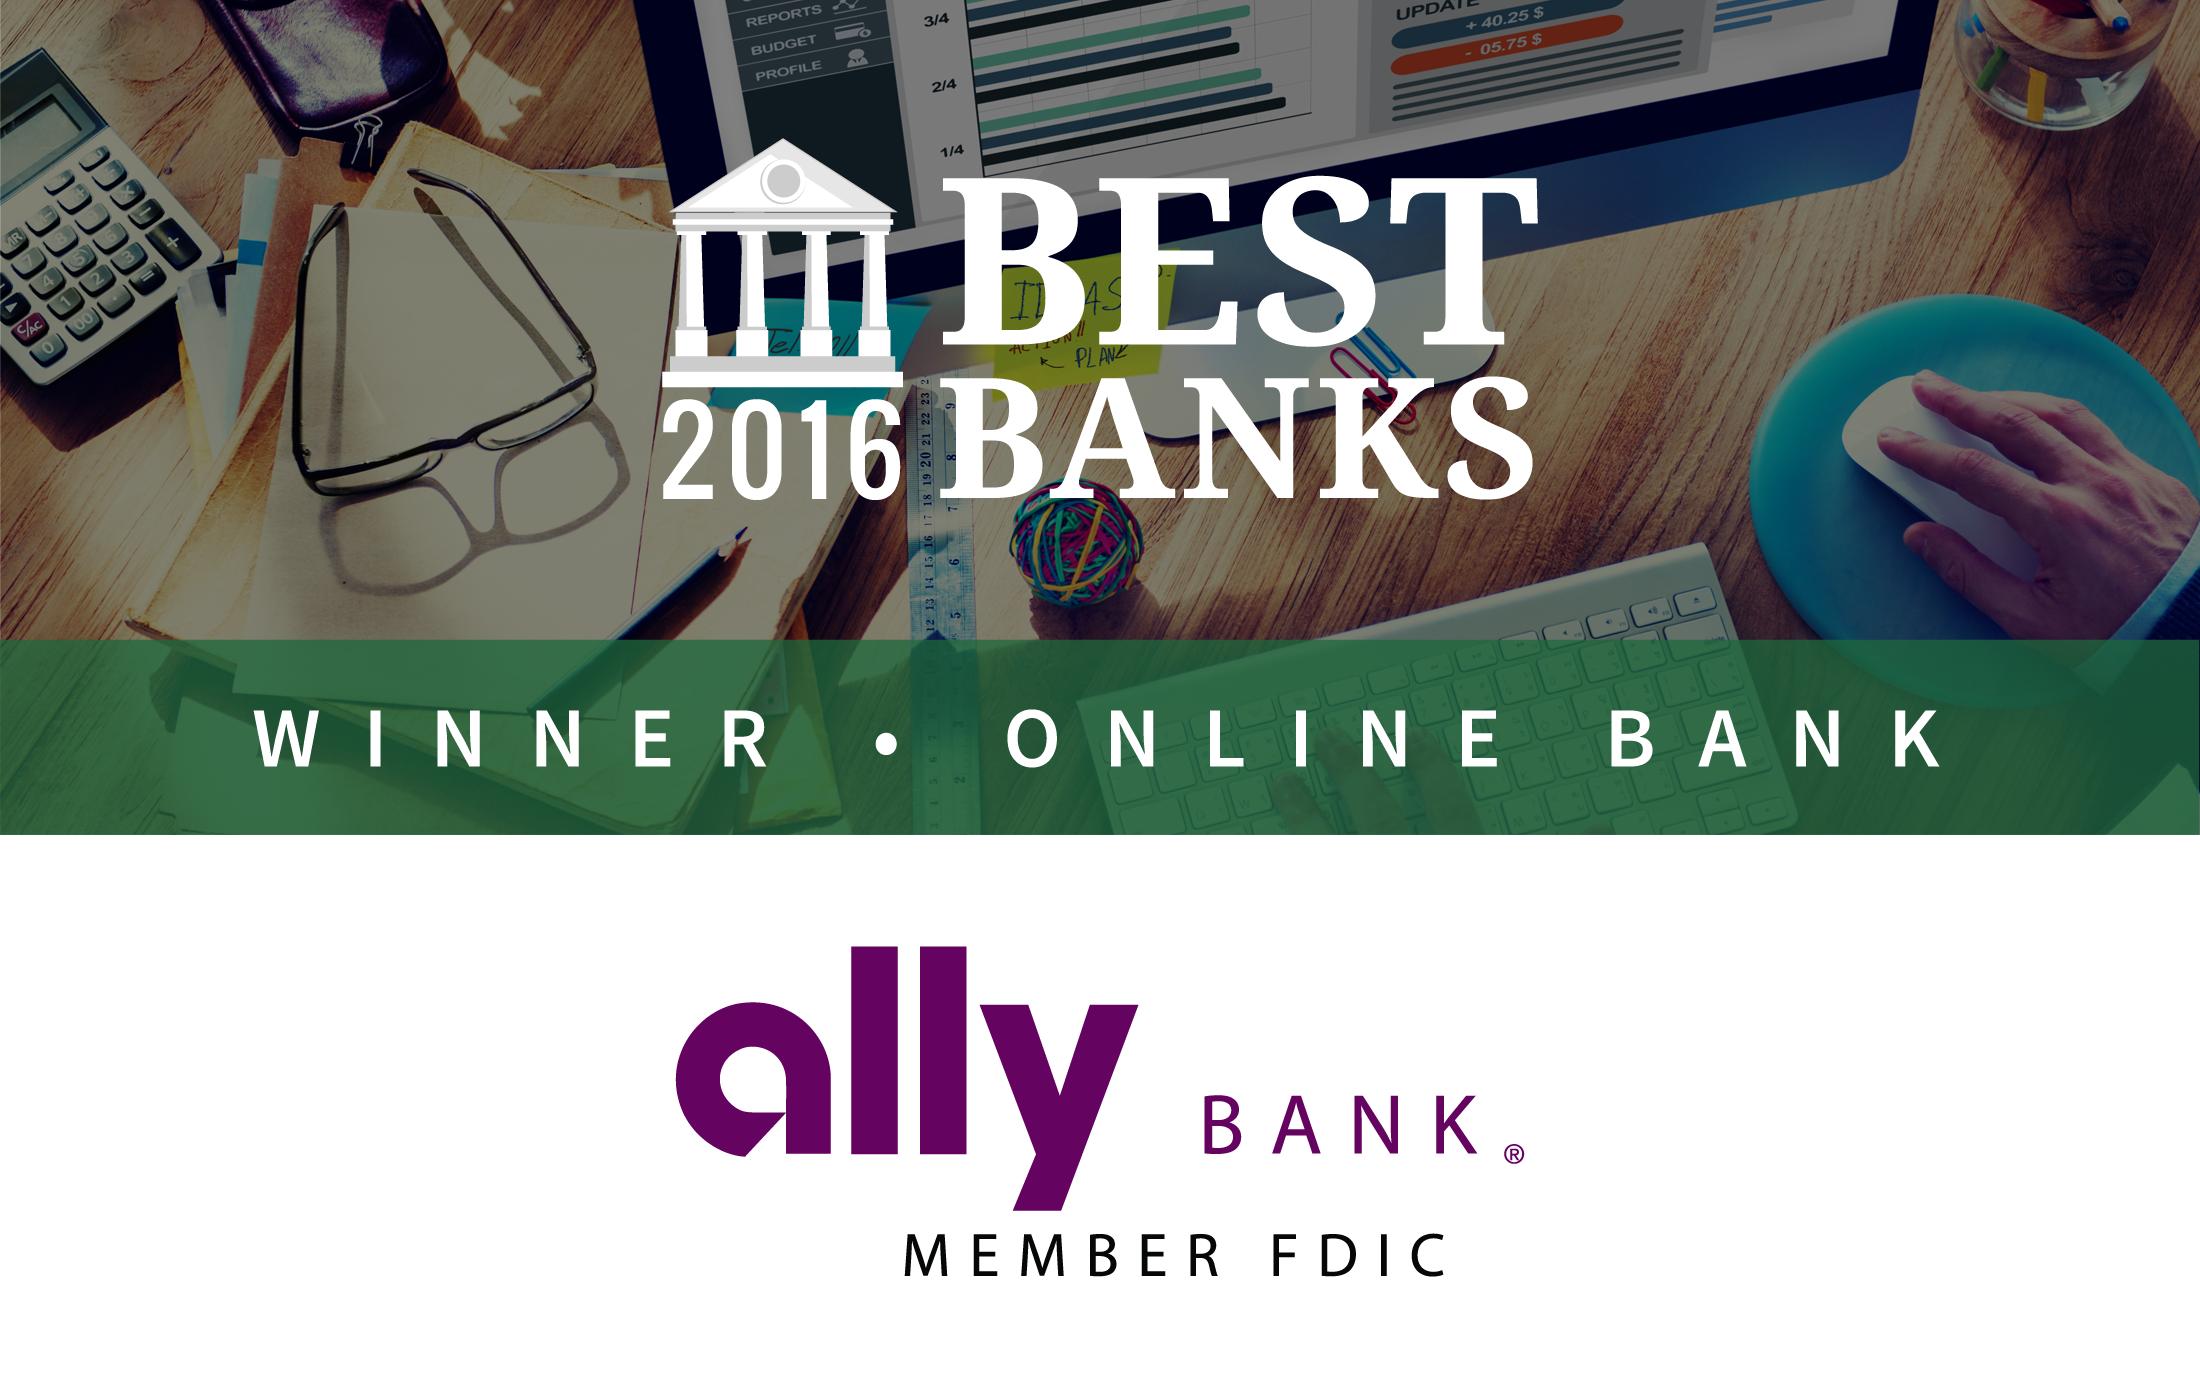 Online Banks Cd Rates Gbr Bestbanks Winnerarticles Online V